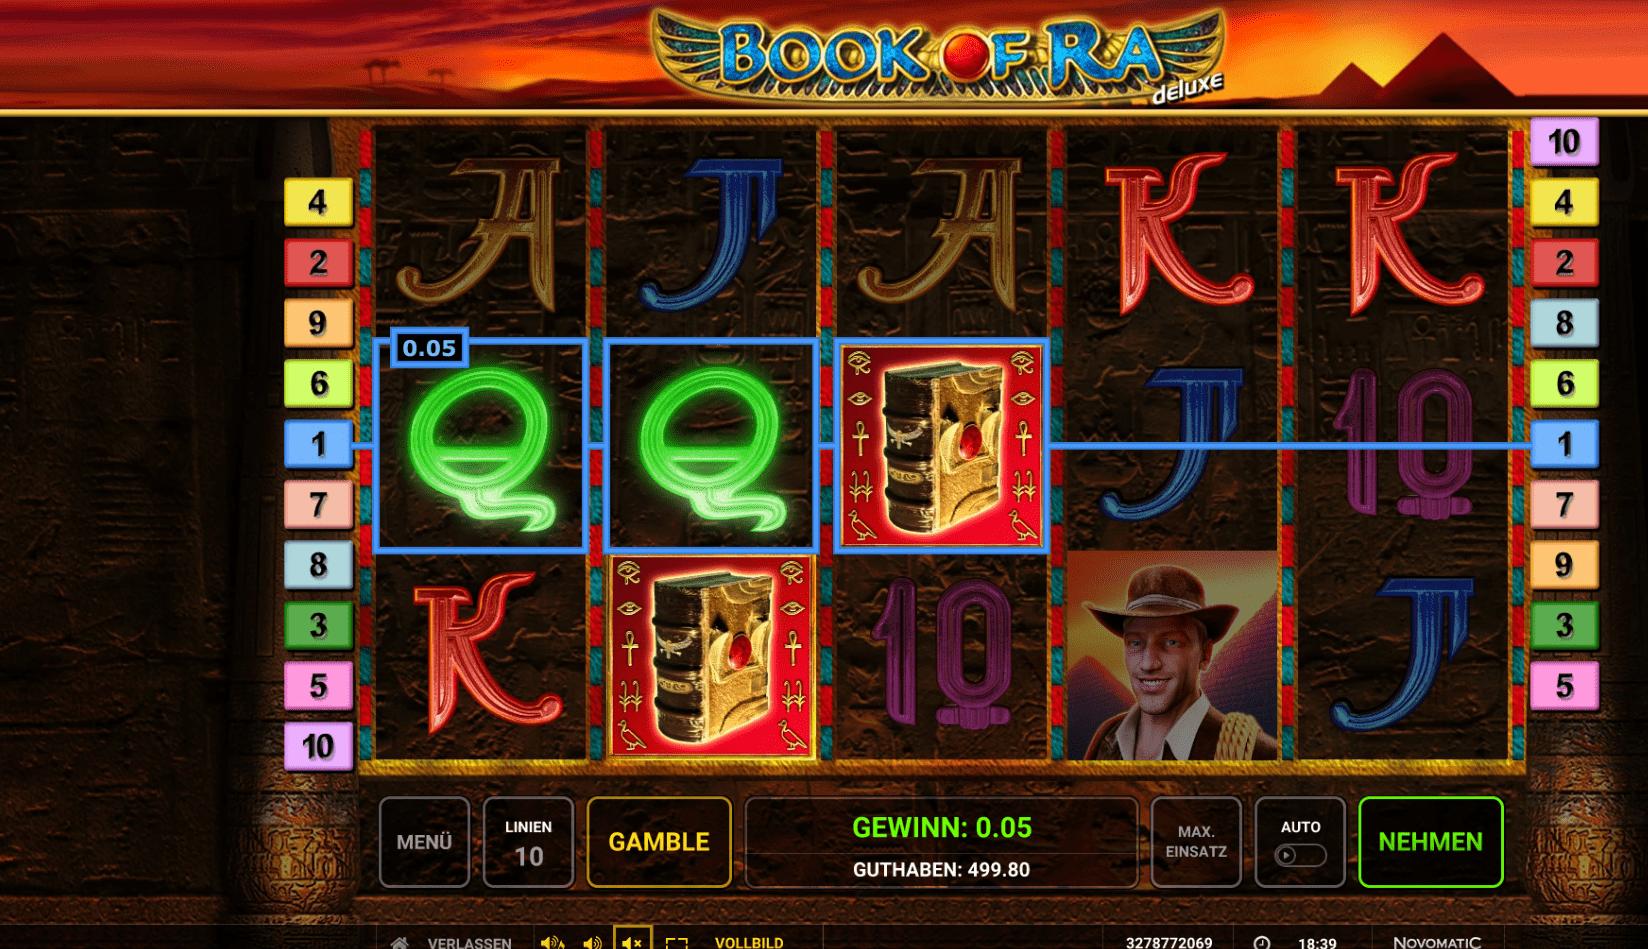 Book of Ra Deluxe Casino777